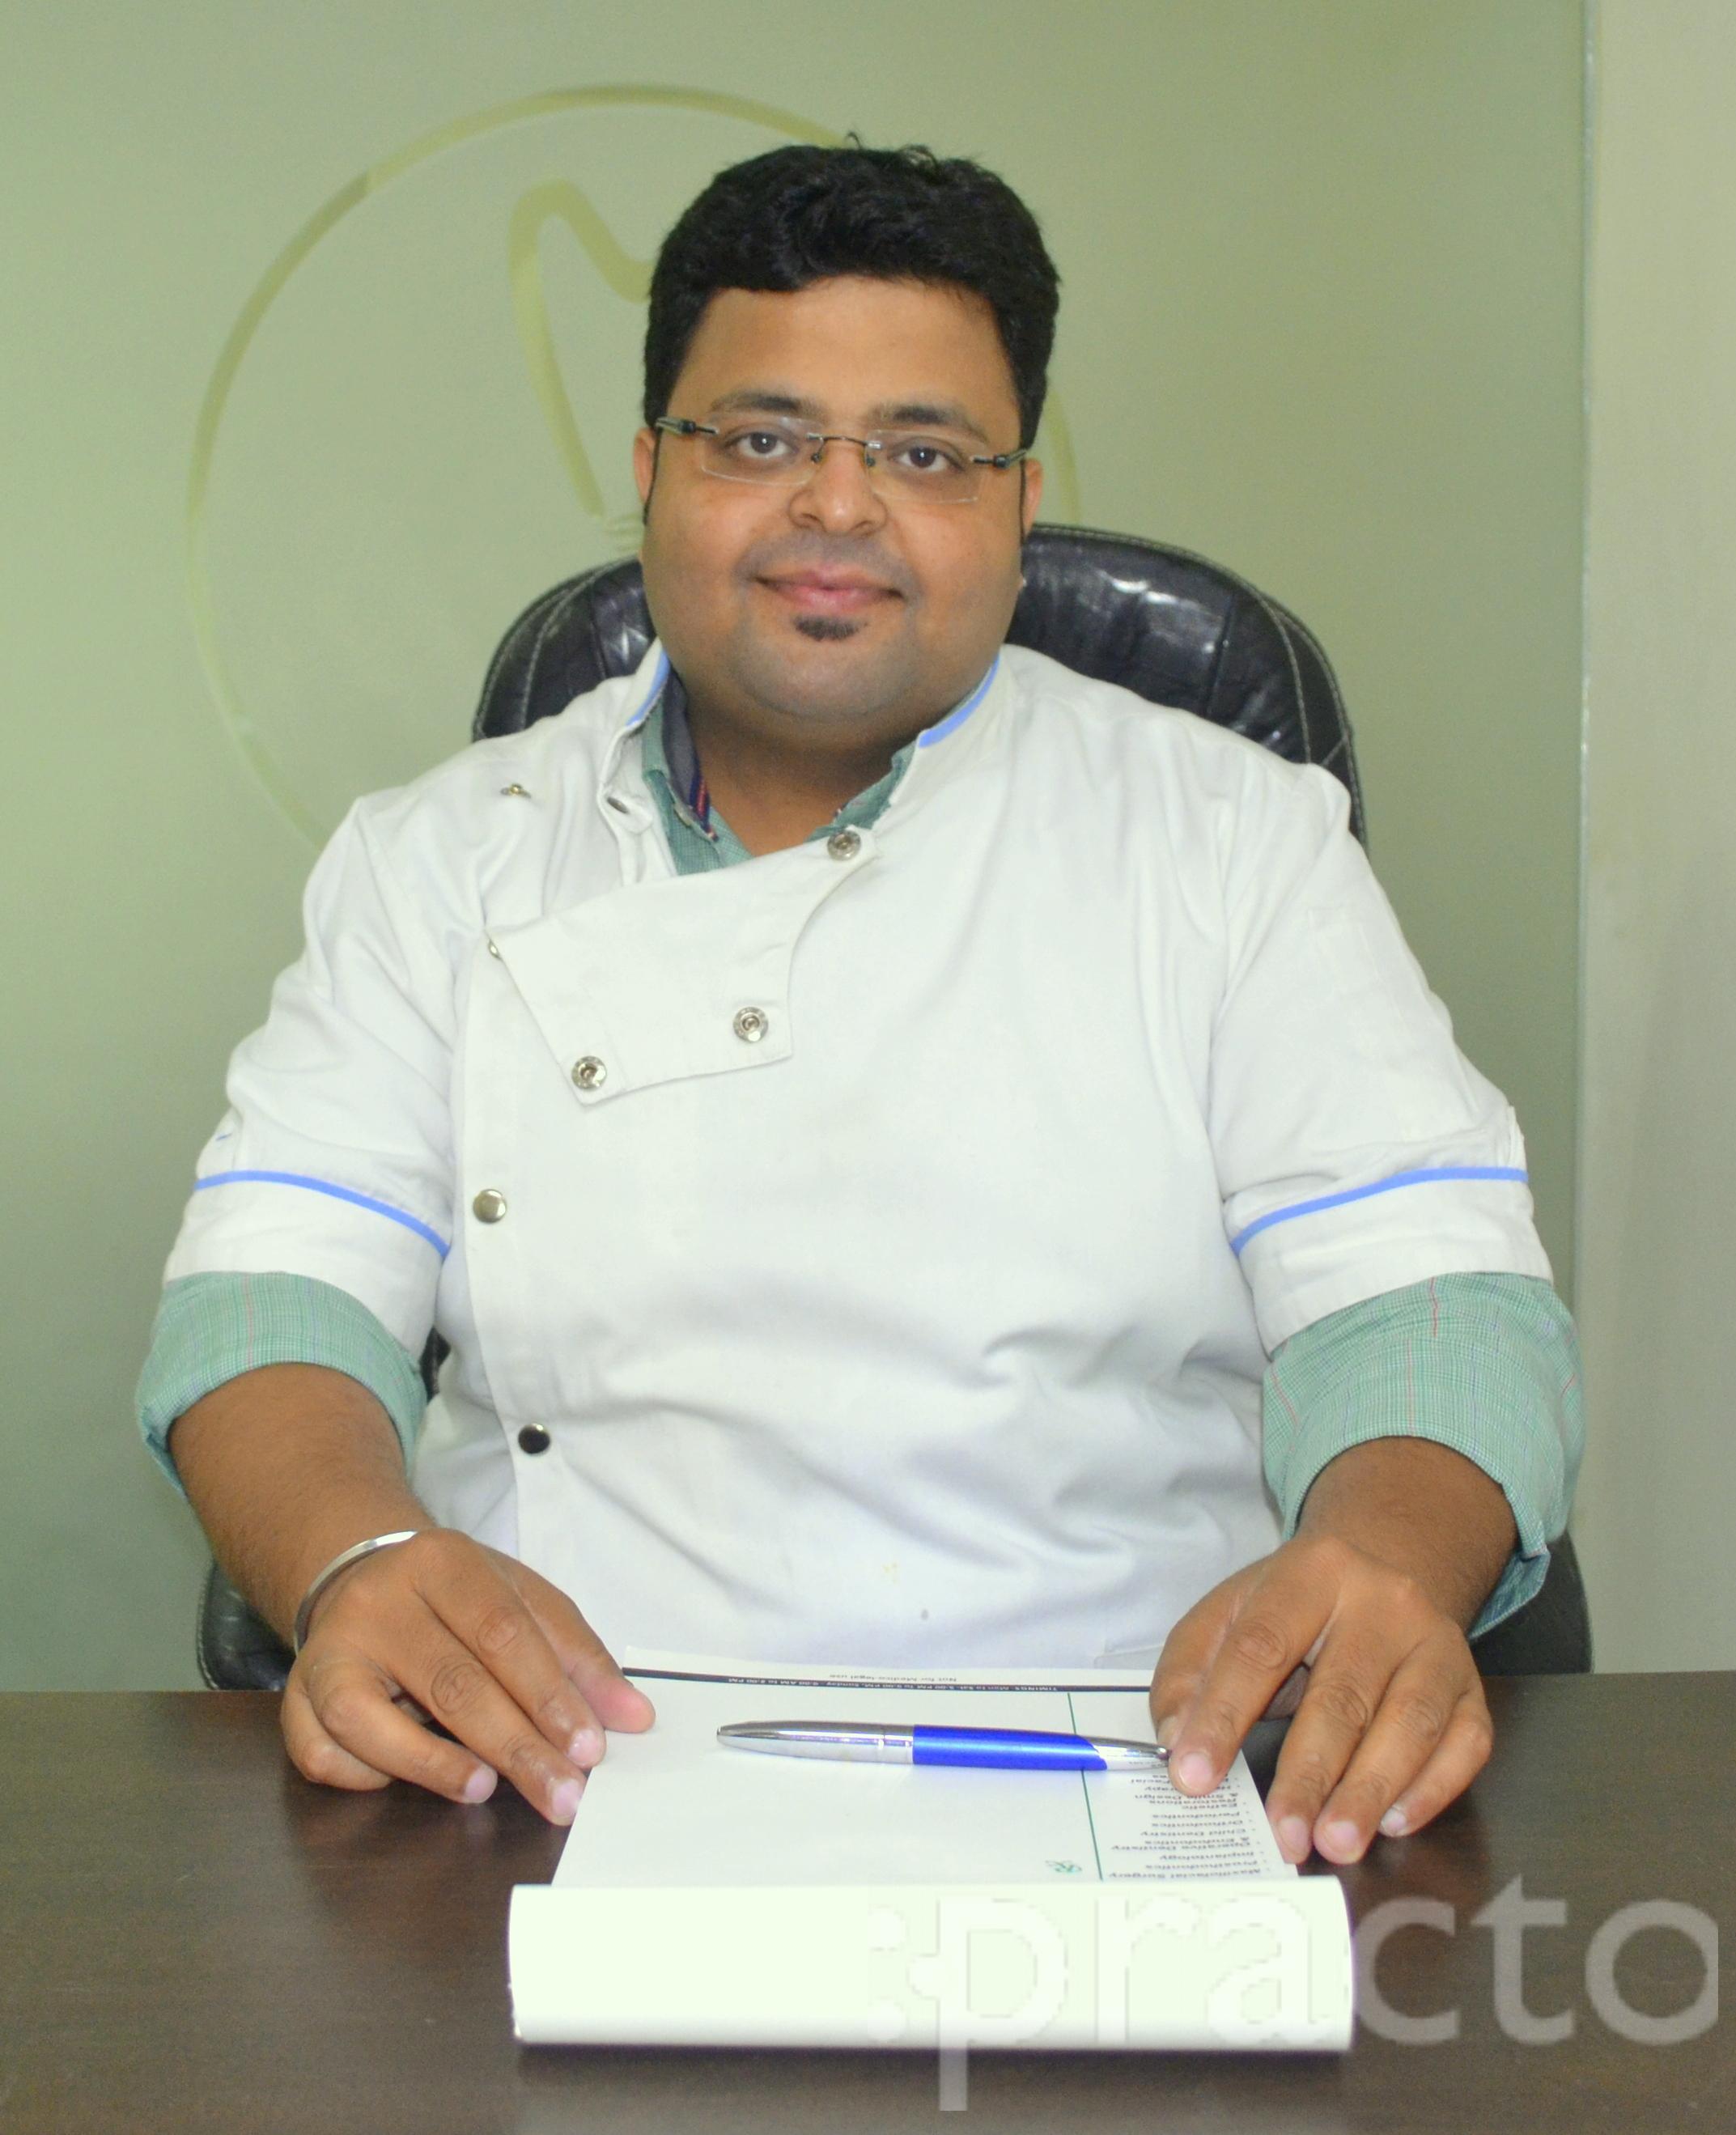 Dr. Manvendra Singh - Dentist